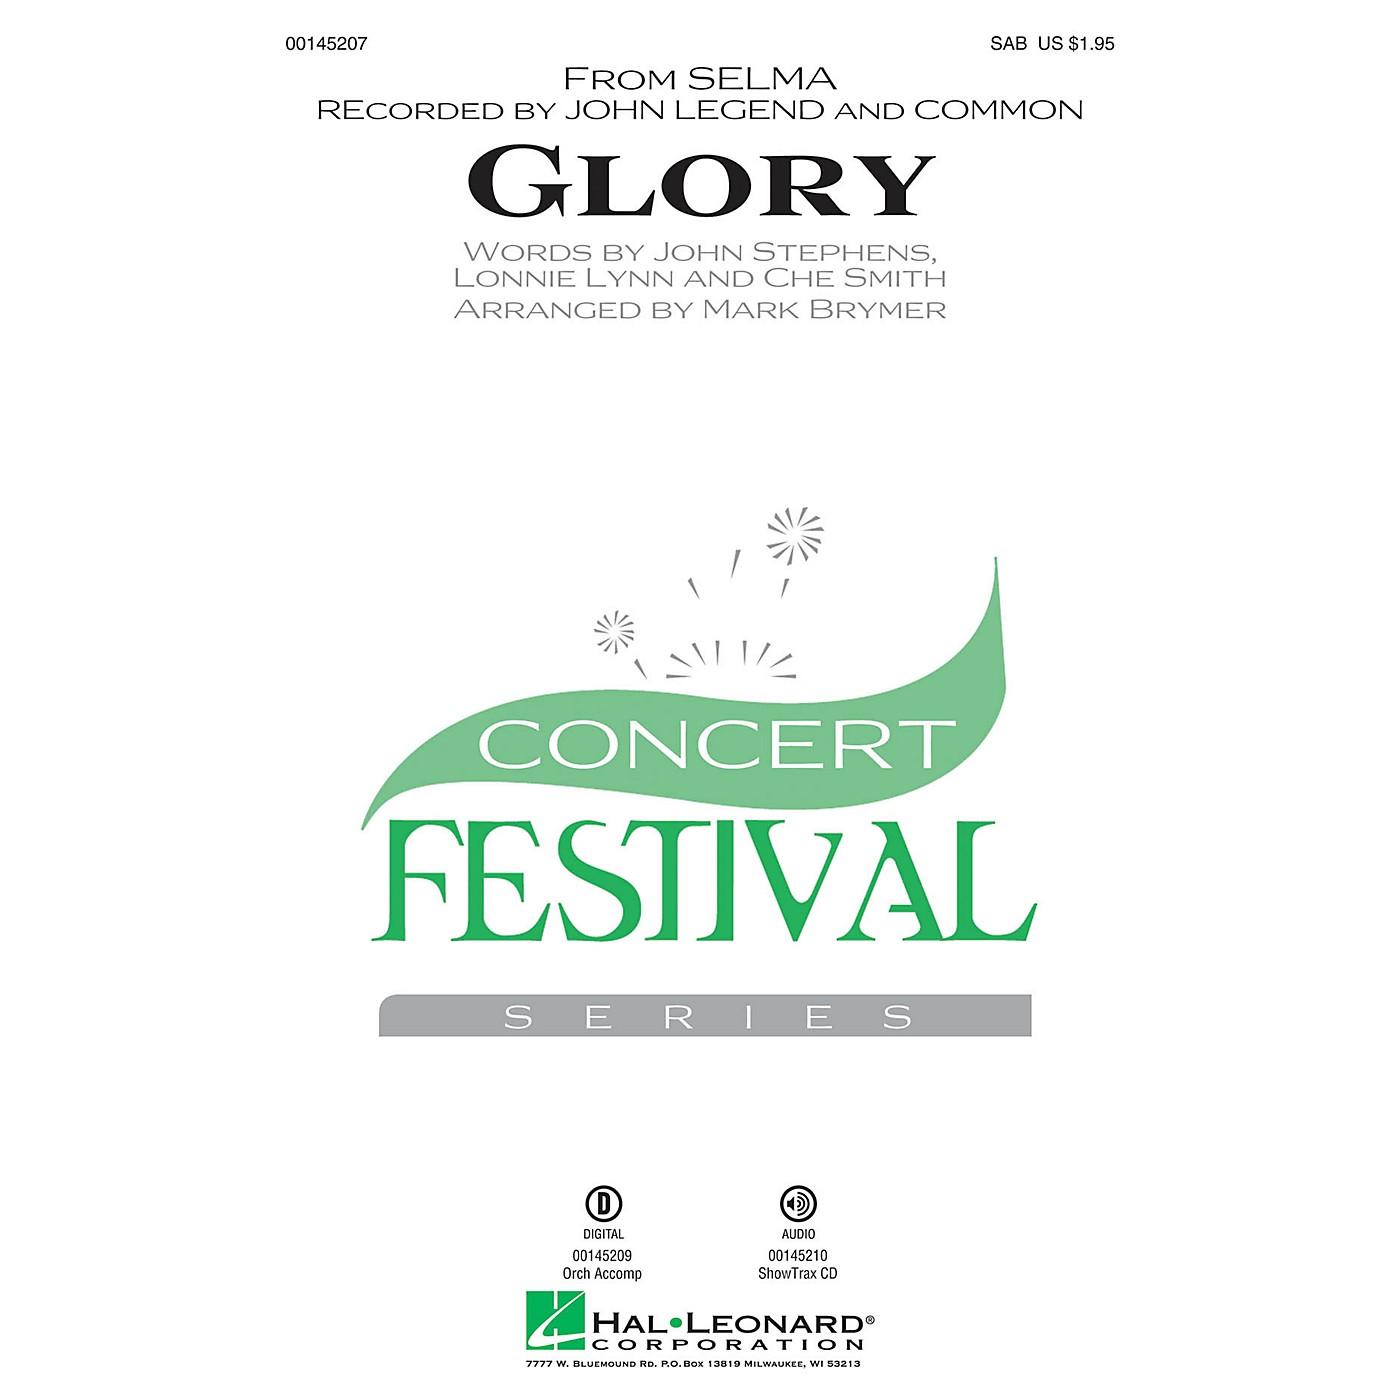 Hal Leonard Glory (from Selma) SAB by John Legend arranged by Mark Brymer thumbnail